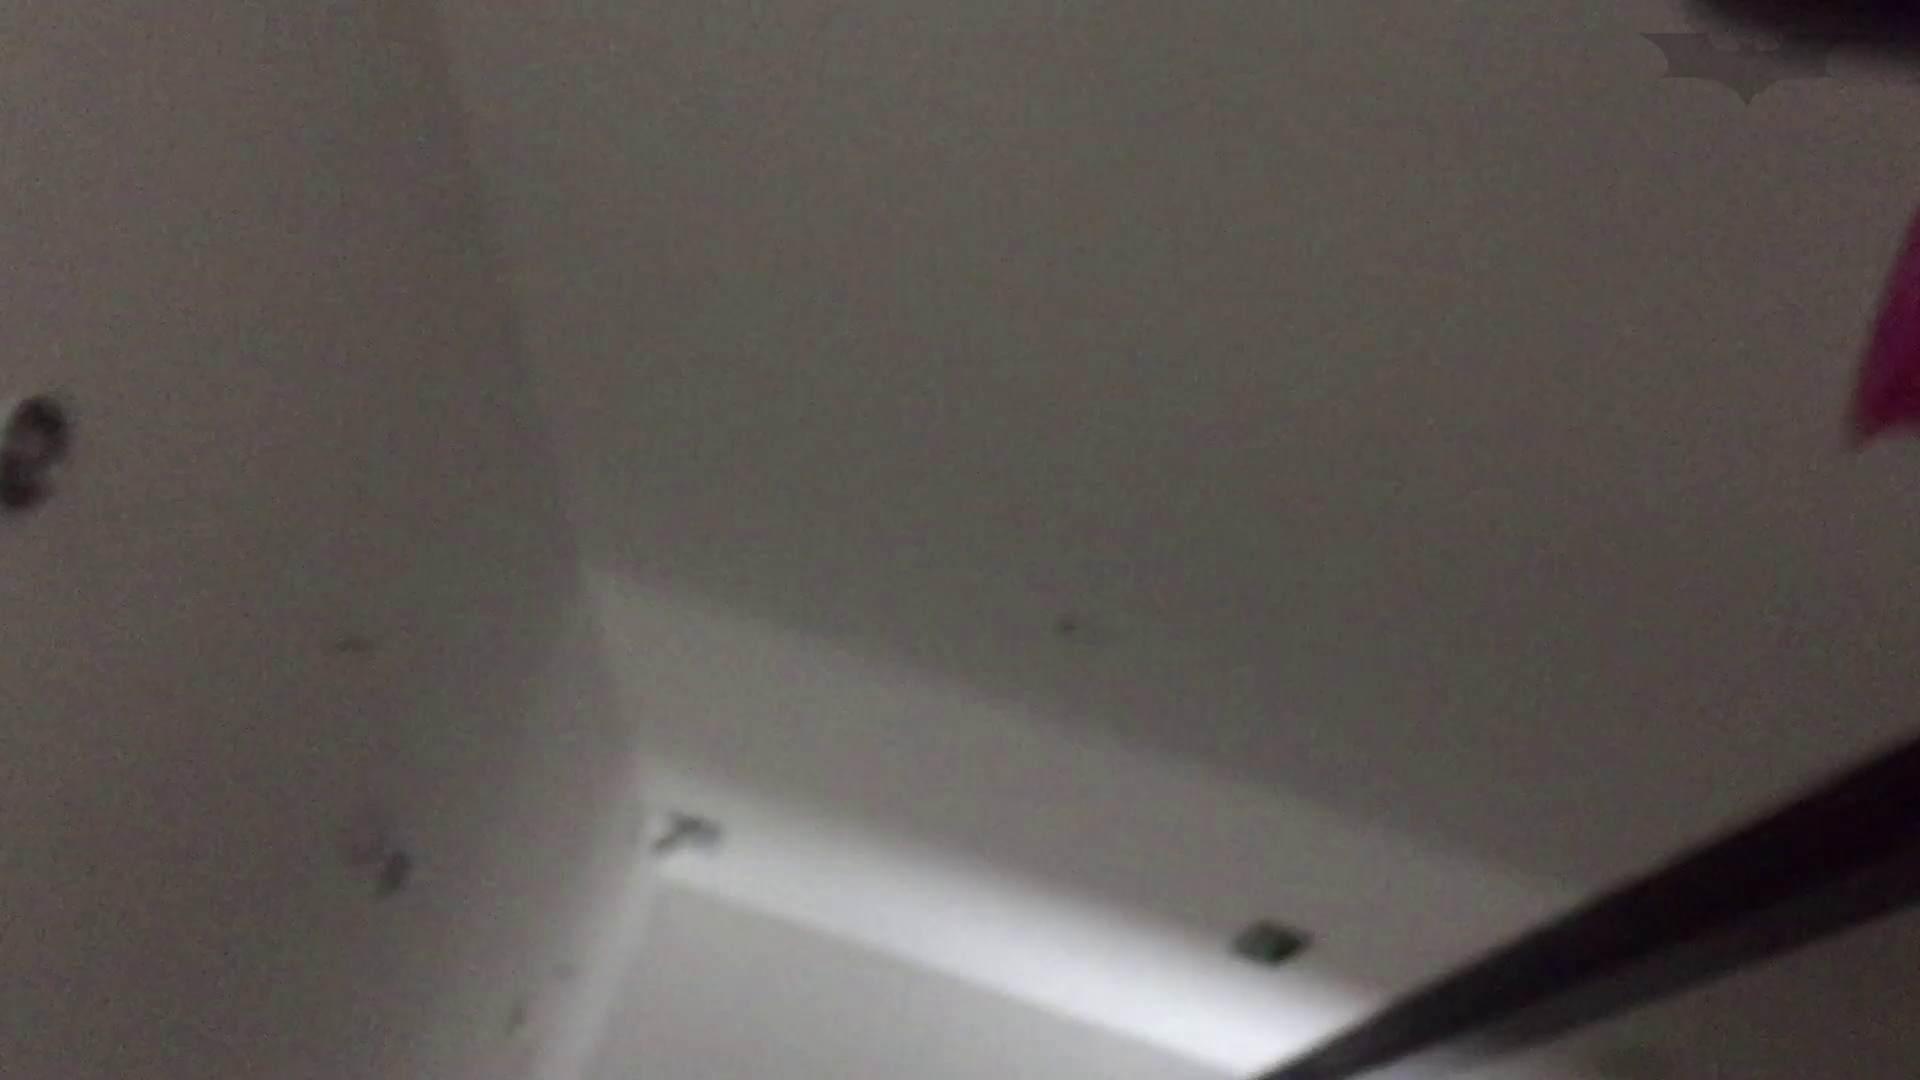 JD盗撮 美女の洗面所の秘密 Vol.74 美女 ぱこり動画紹介 52画像 38